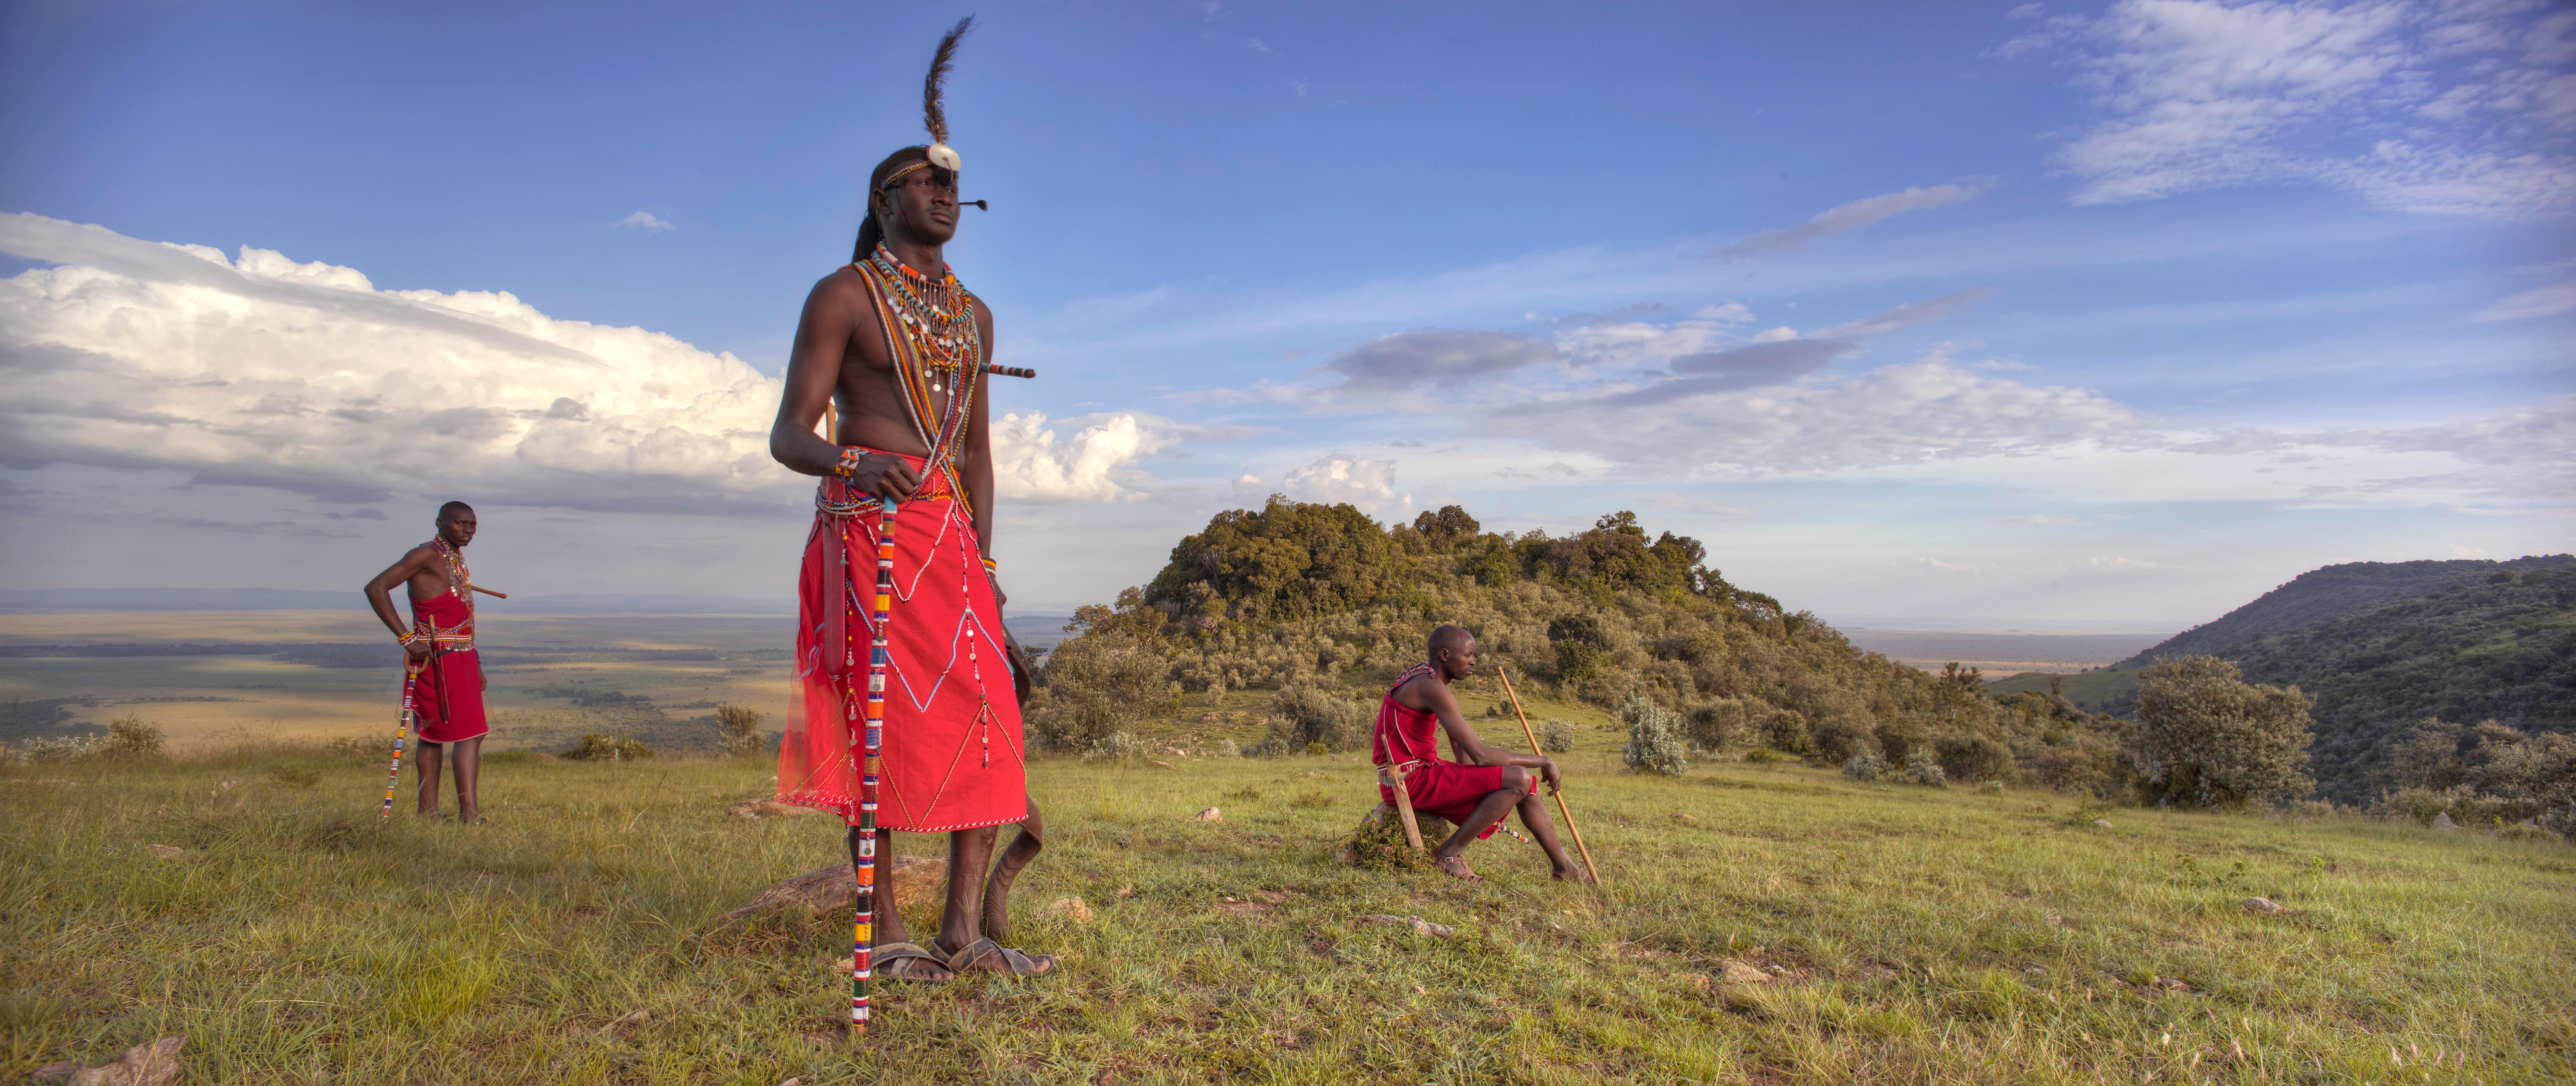 Tanzania Serengeti with the Great Migration